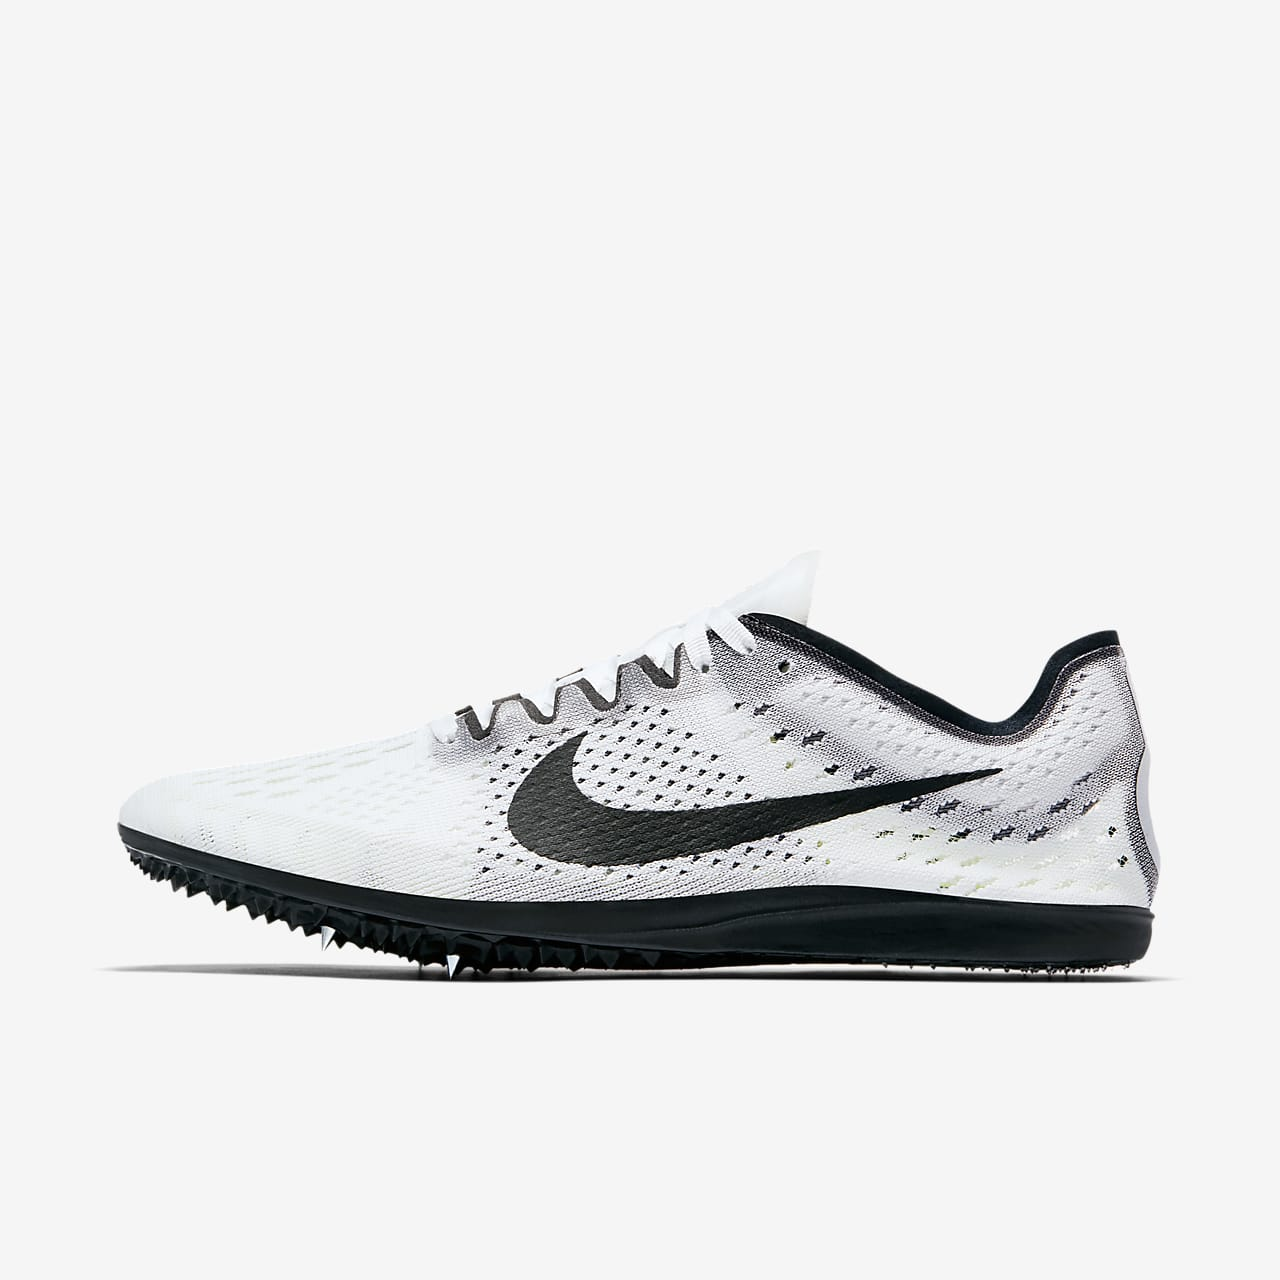 Kolce startowe Nike Zoom Matumbo 3